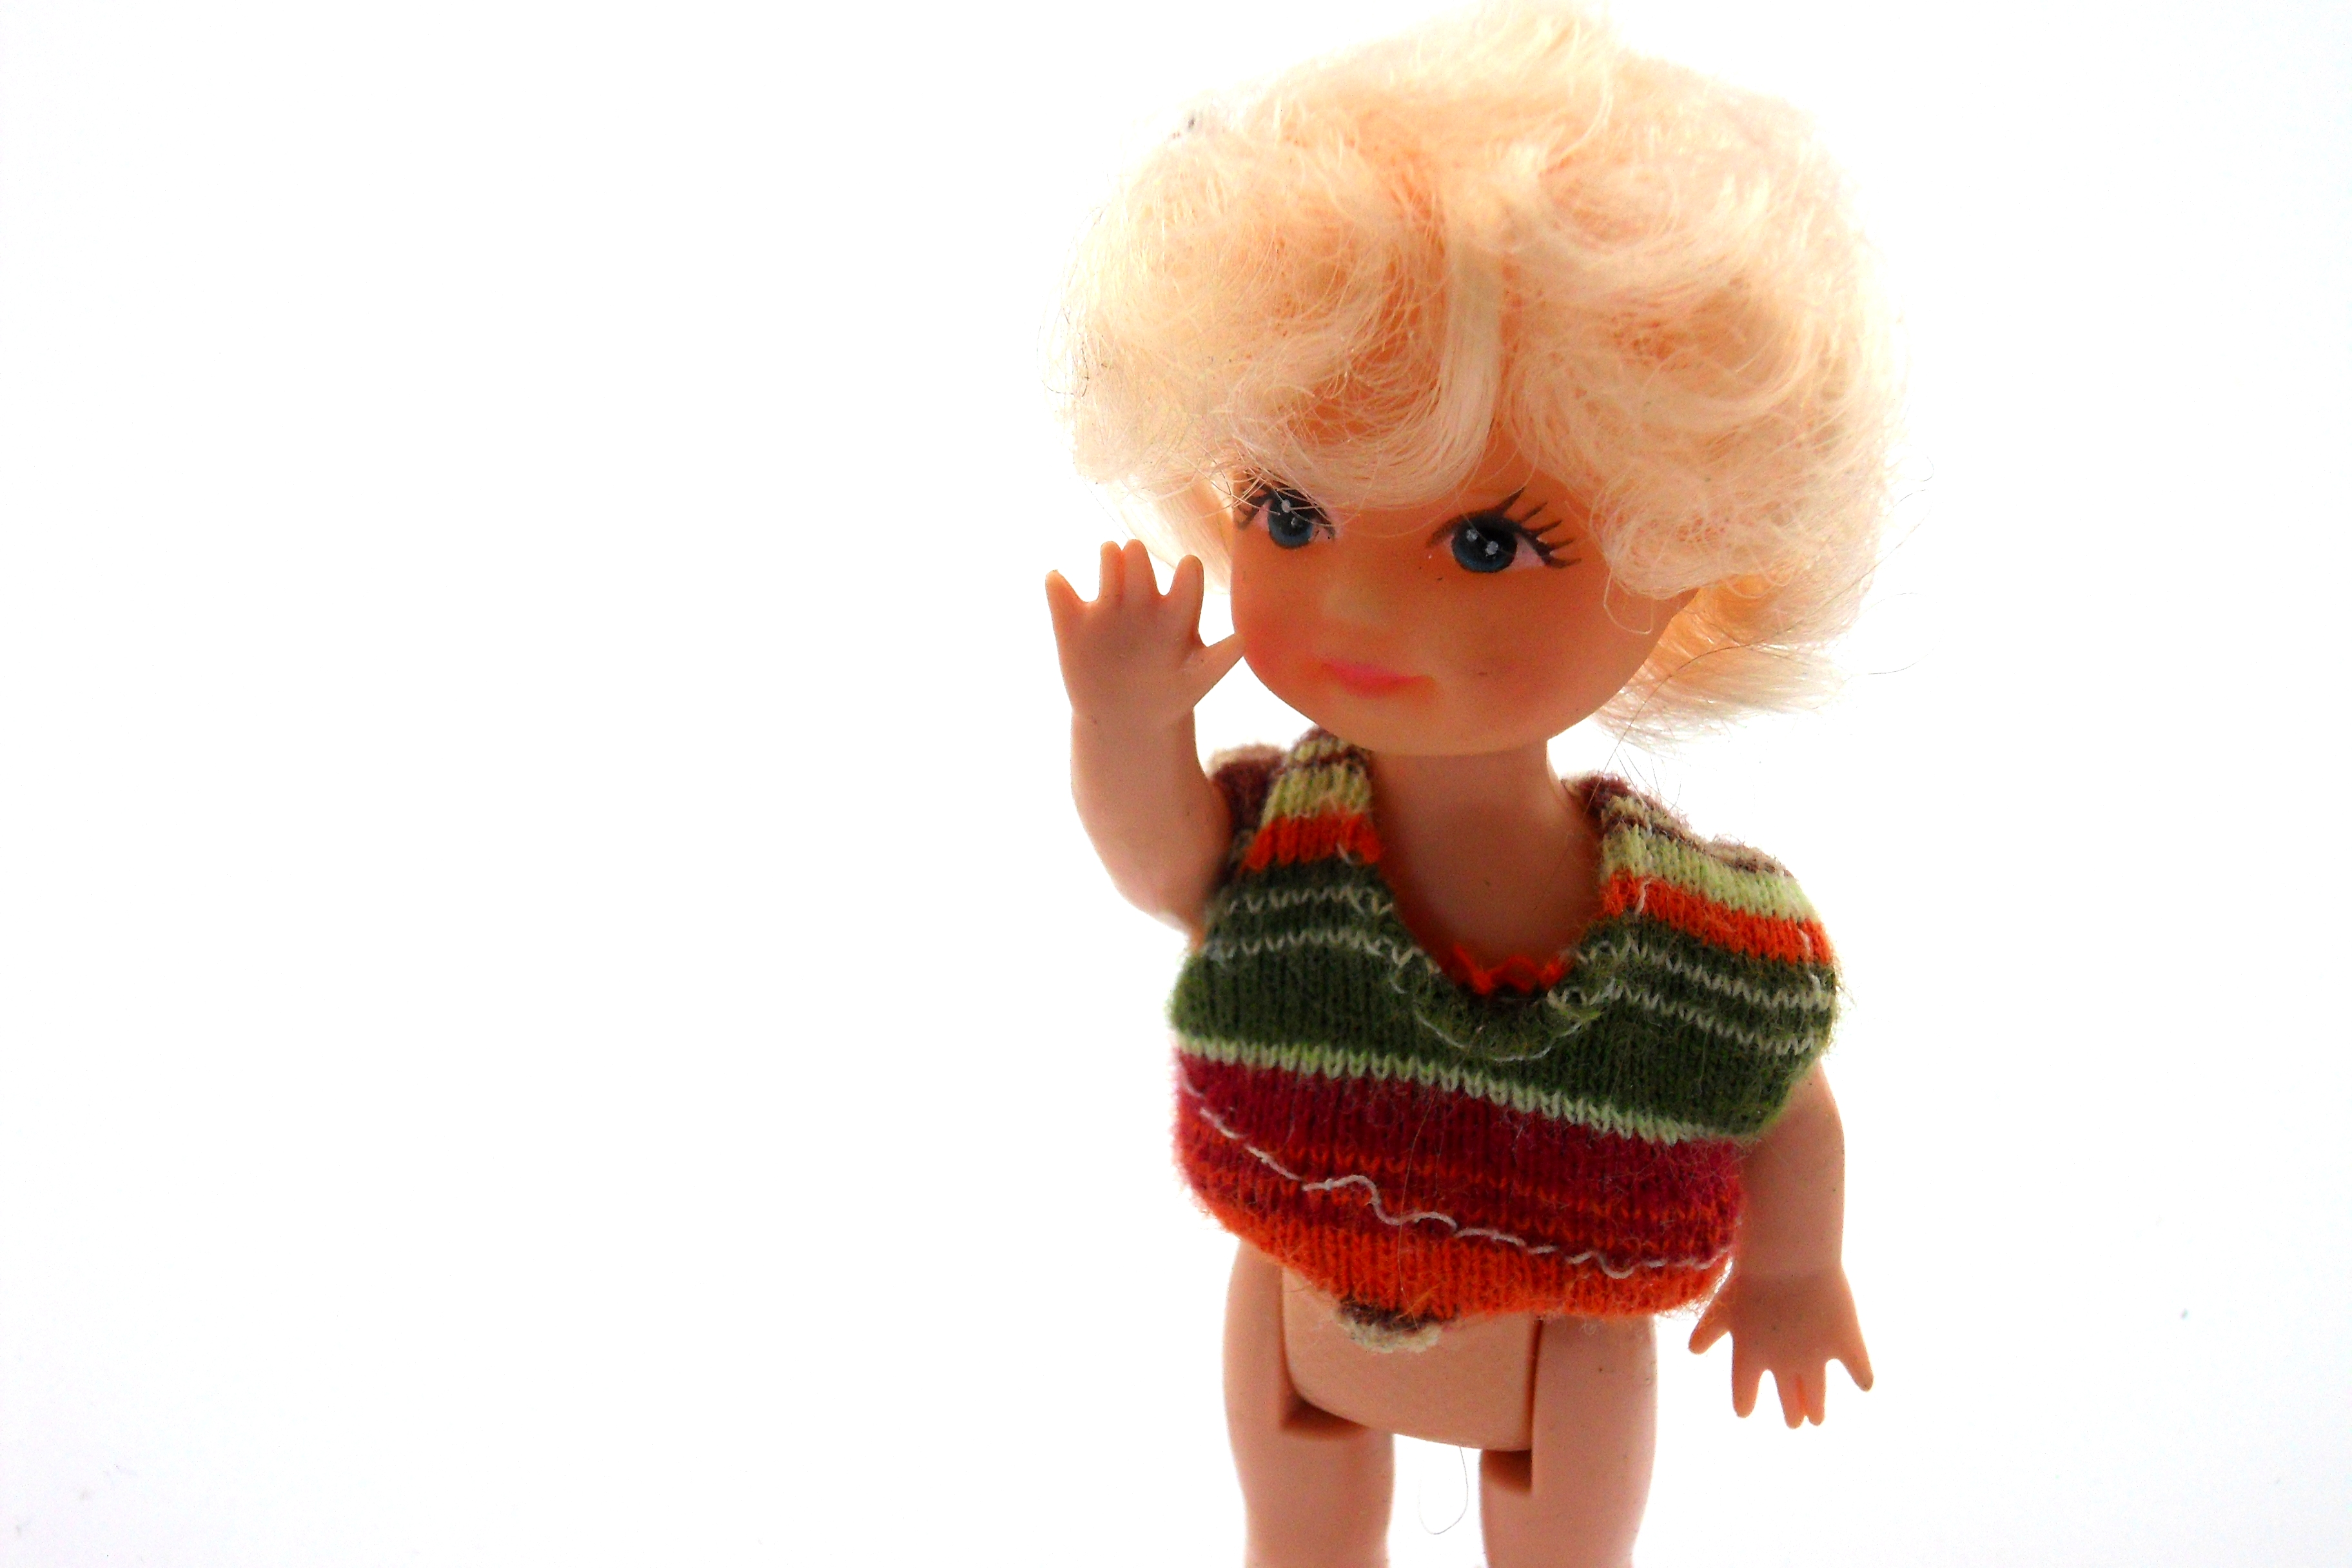 Plastic doll figure photo